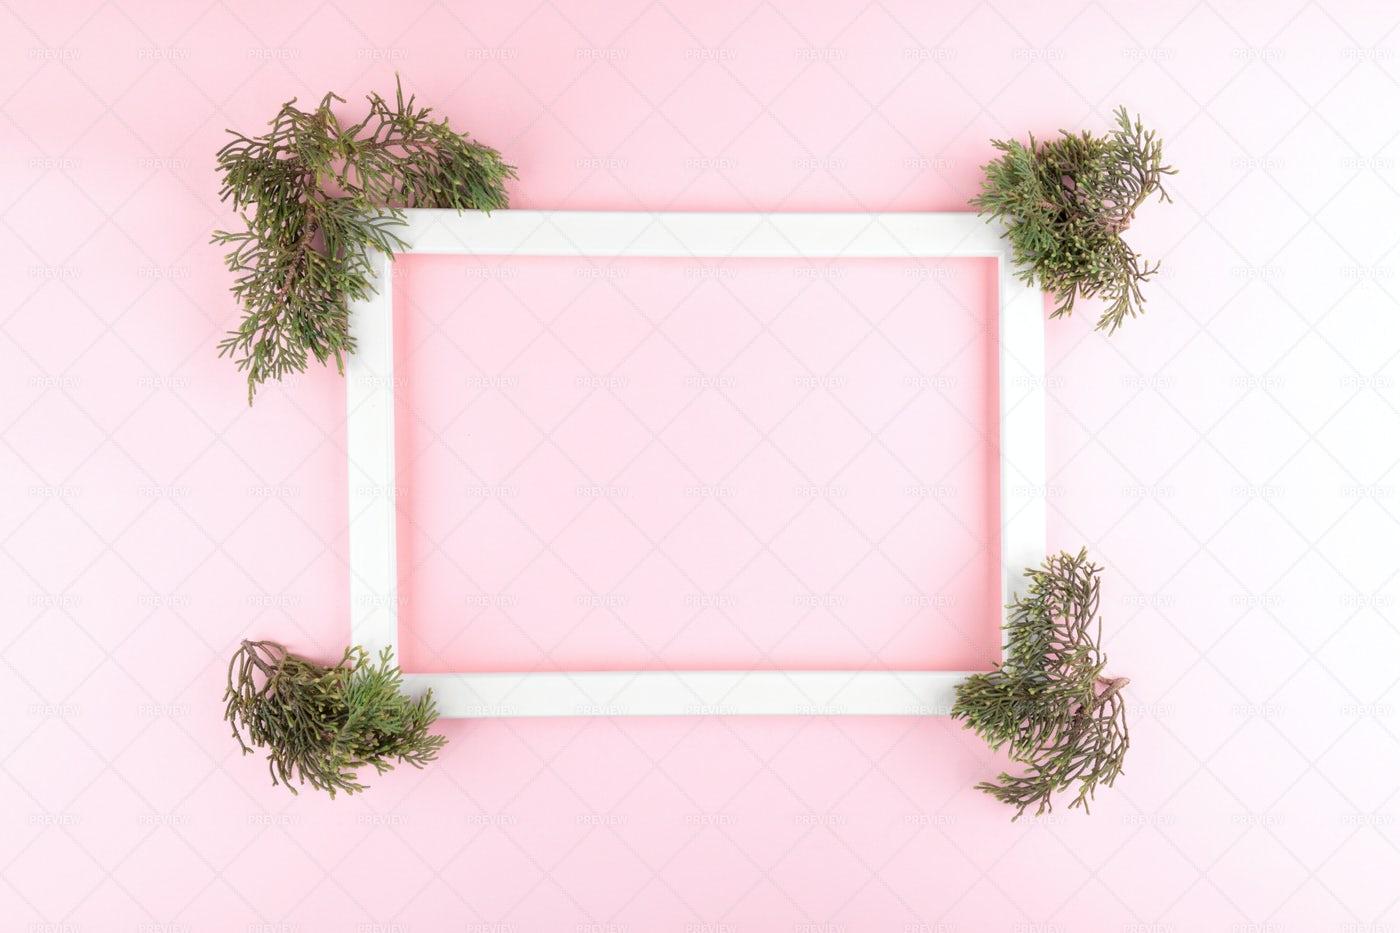 Festive Elegant Frame: Stock Photos